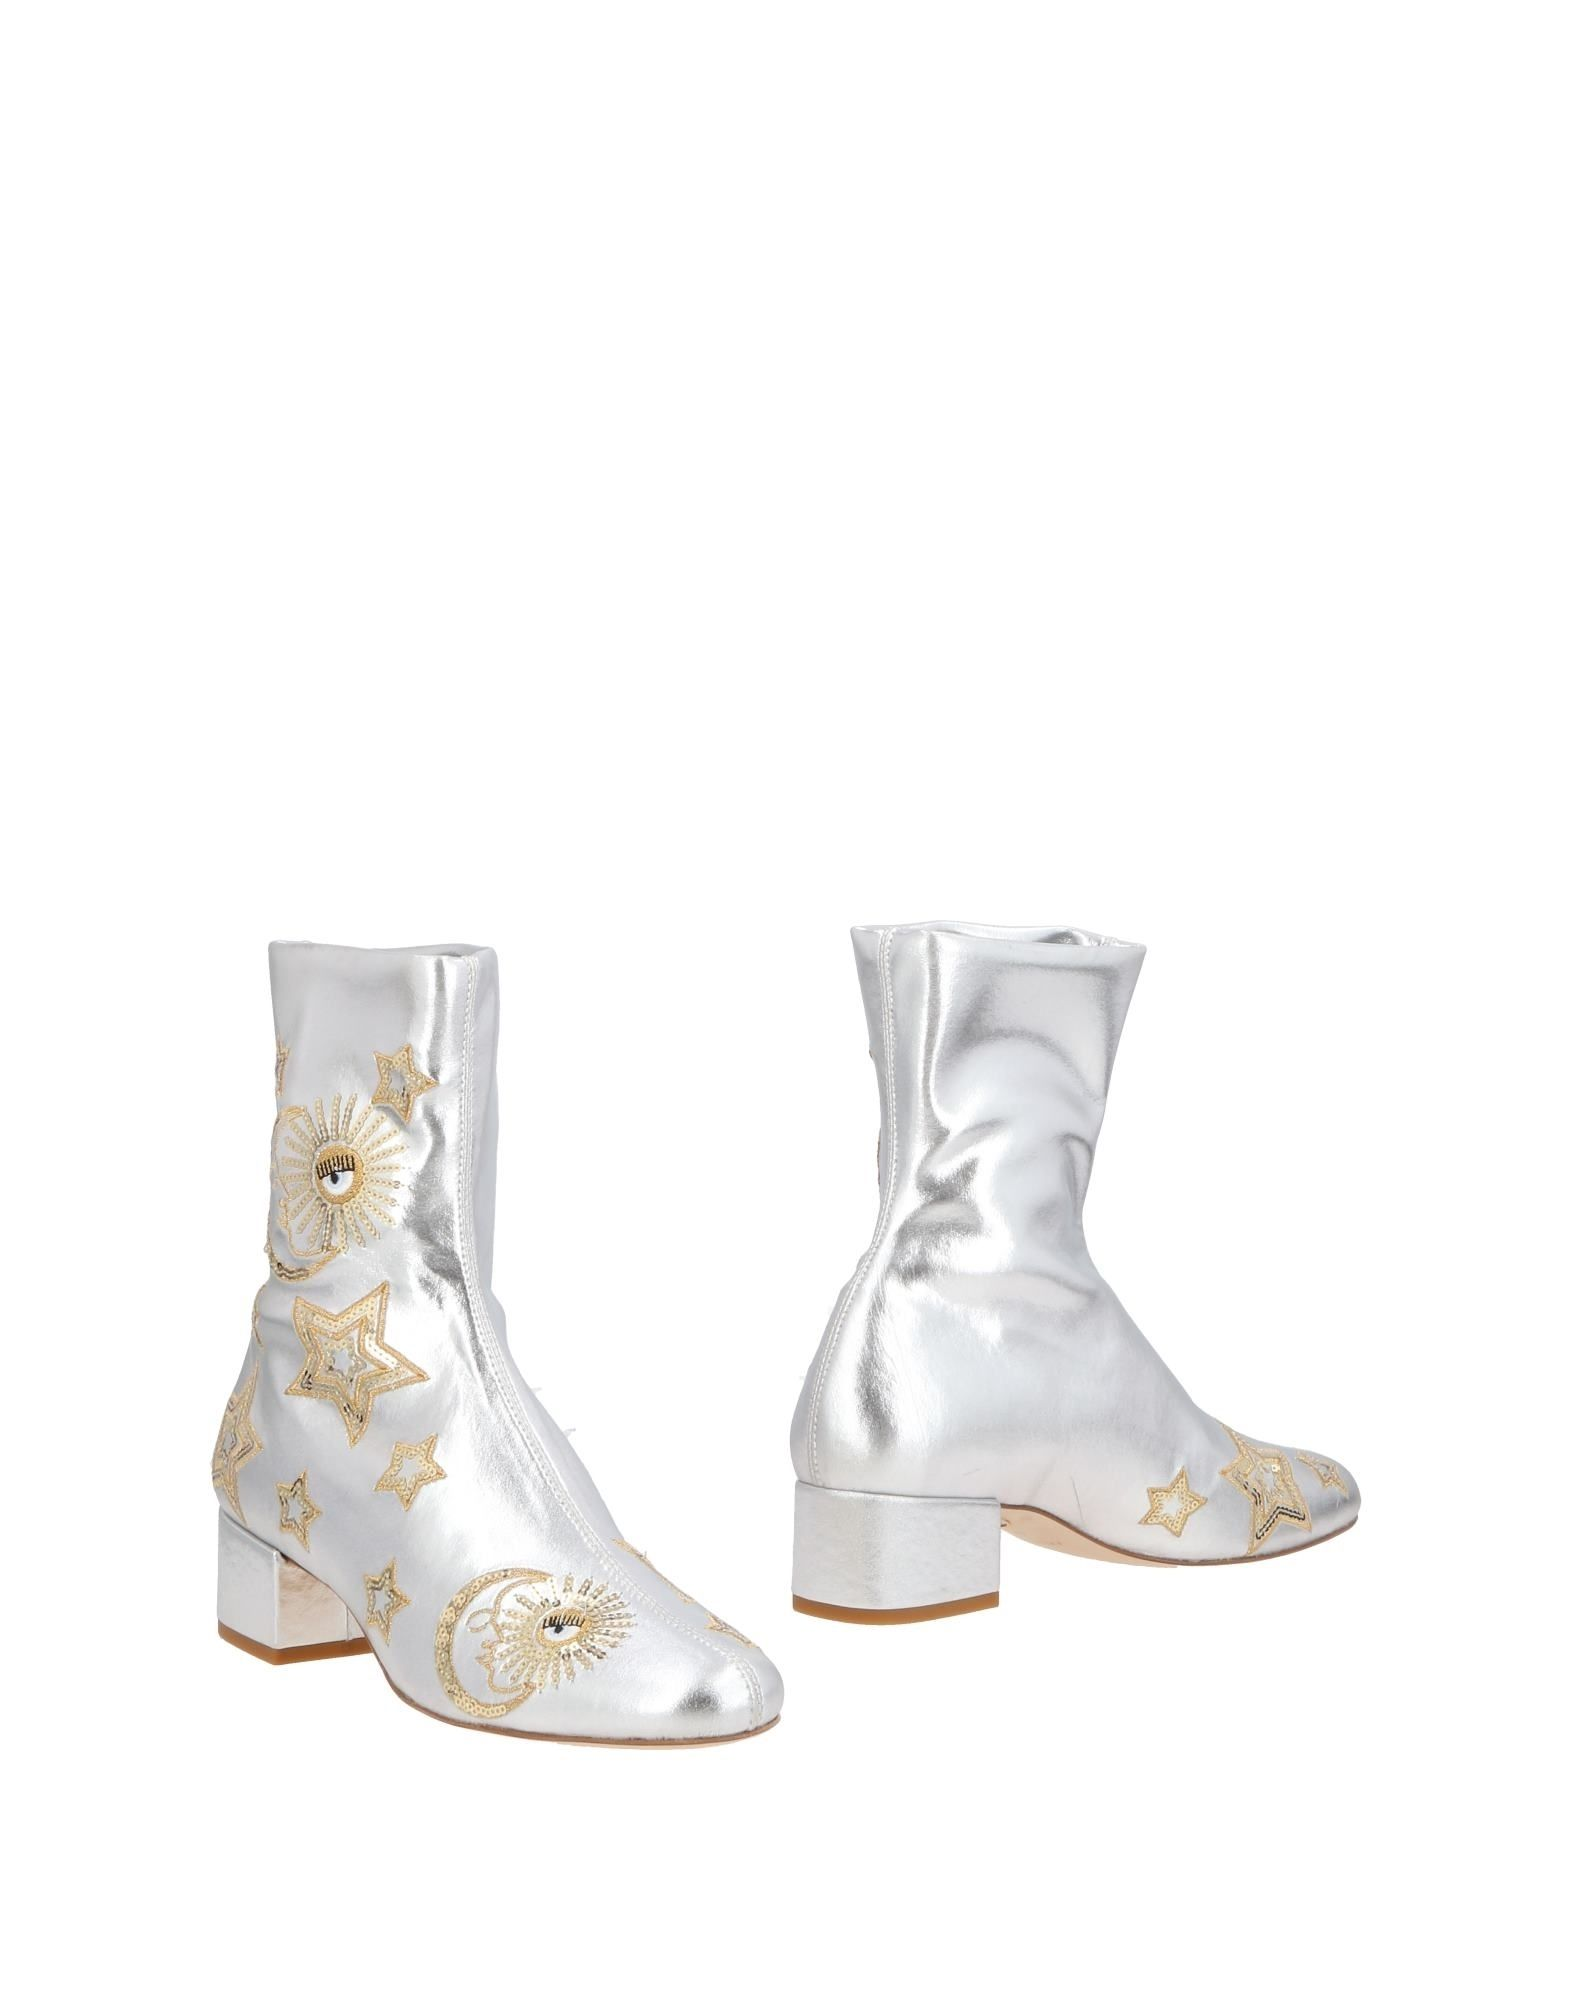 Rabatt Schuhe  Chiara Ferragni Stiefelette Damen  Schuhe 11492943JO e27e94